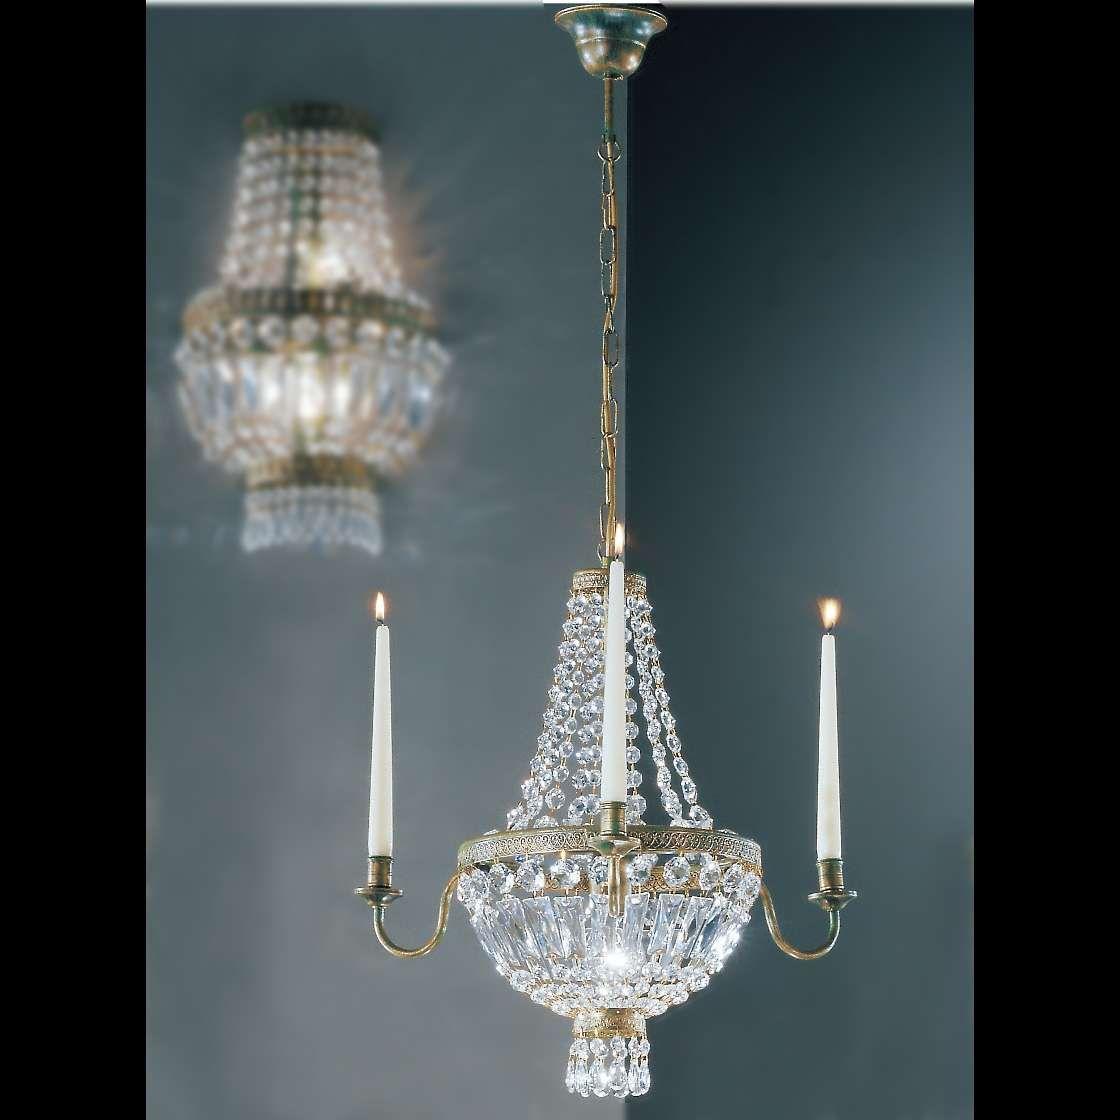 Moderne kronleuchter glas : Online get cheap beleuchtung moderne kronleuchter aliexpress.com